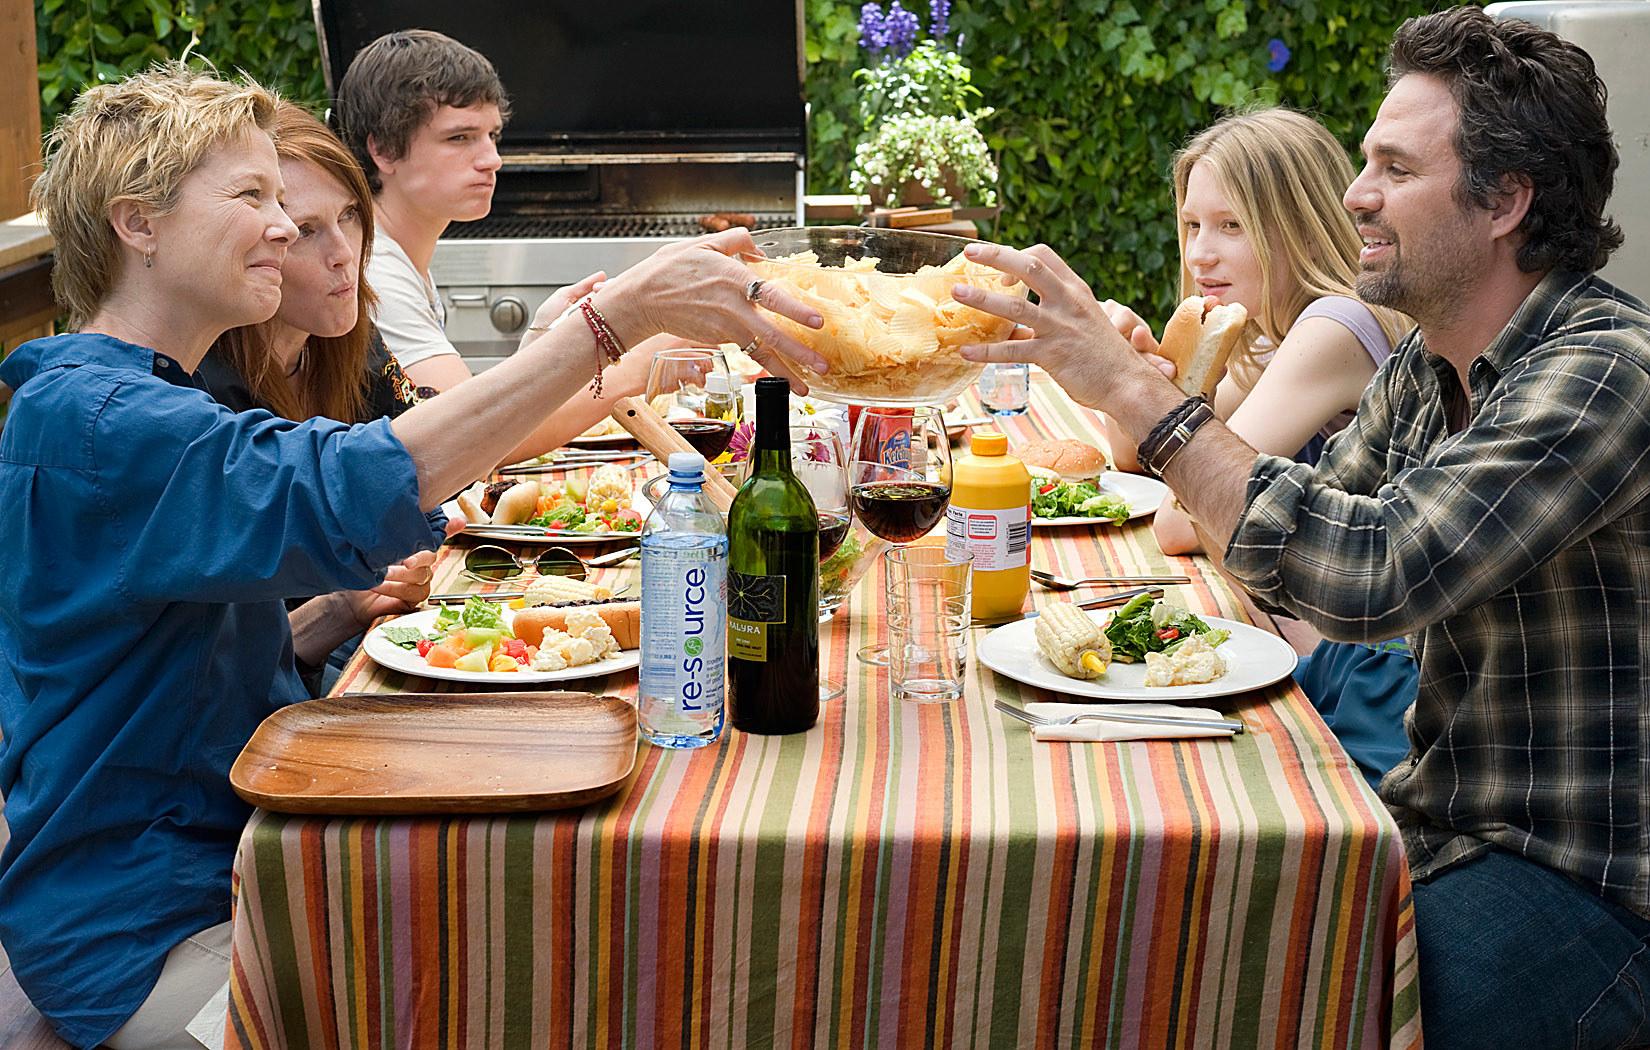 Annette Bening, Julianne Moore, Josh Hutcherson, Mia Wasikowska, Mark Ruffalo at a table